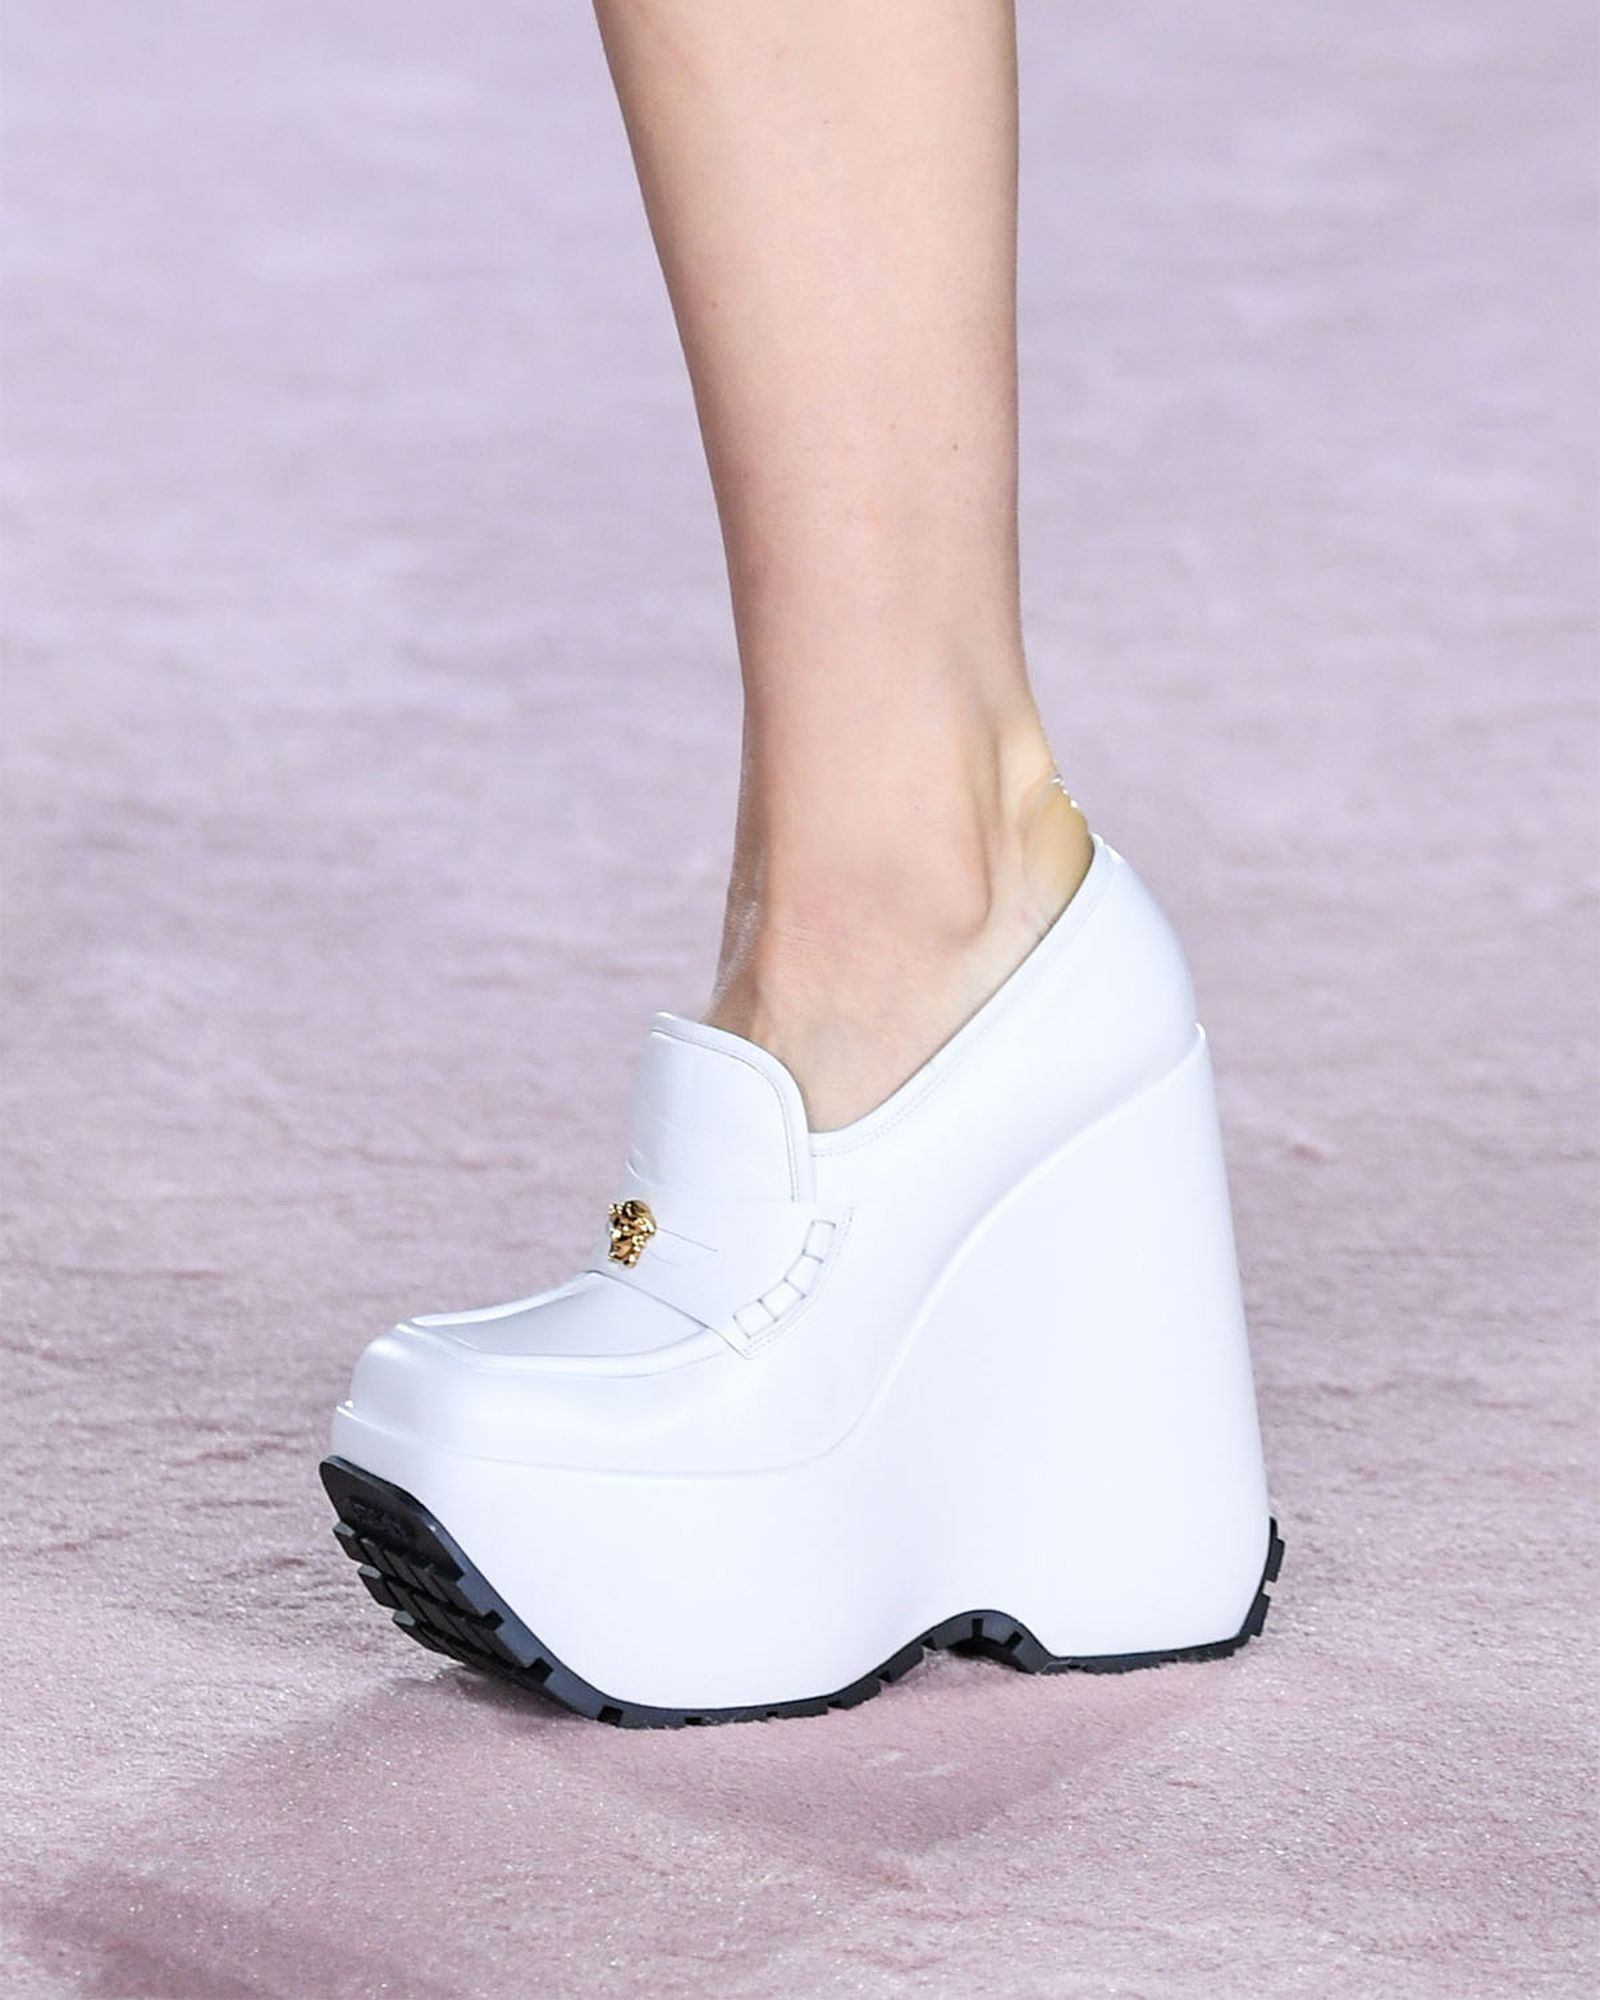 heels-spring-summer-2022-trend-07